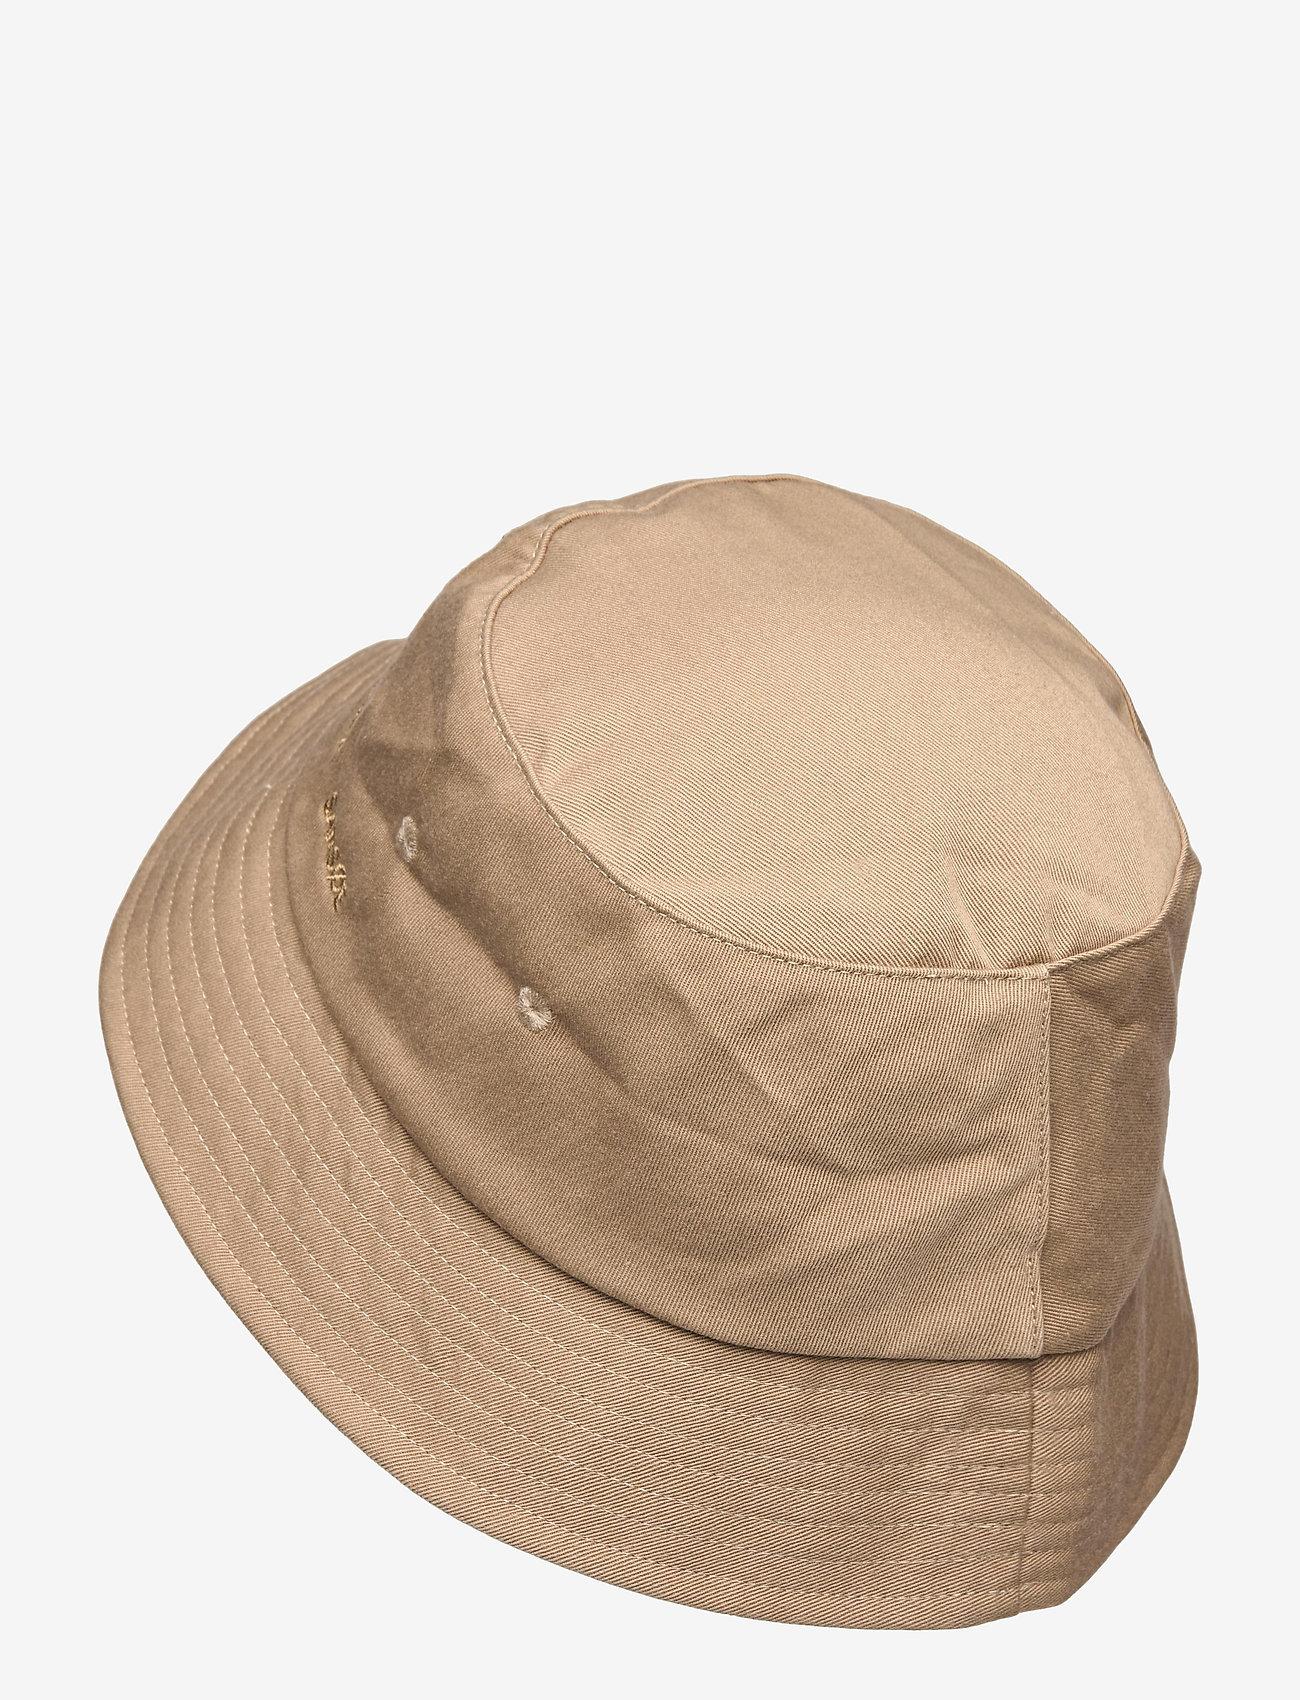 Samsøe Samsøe - Anton bucket hat 14061 - bonnets & casquettes - caribou - 1